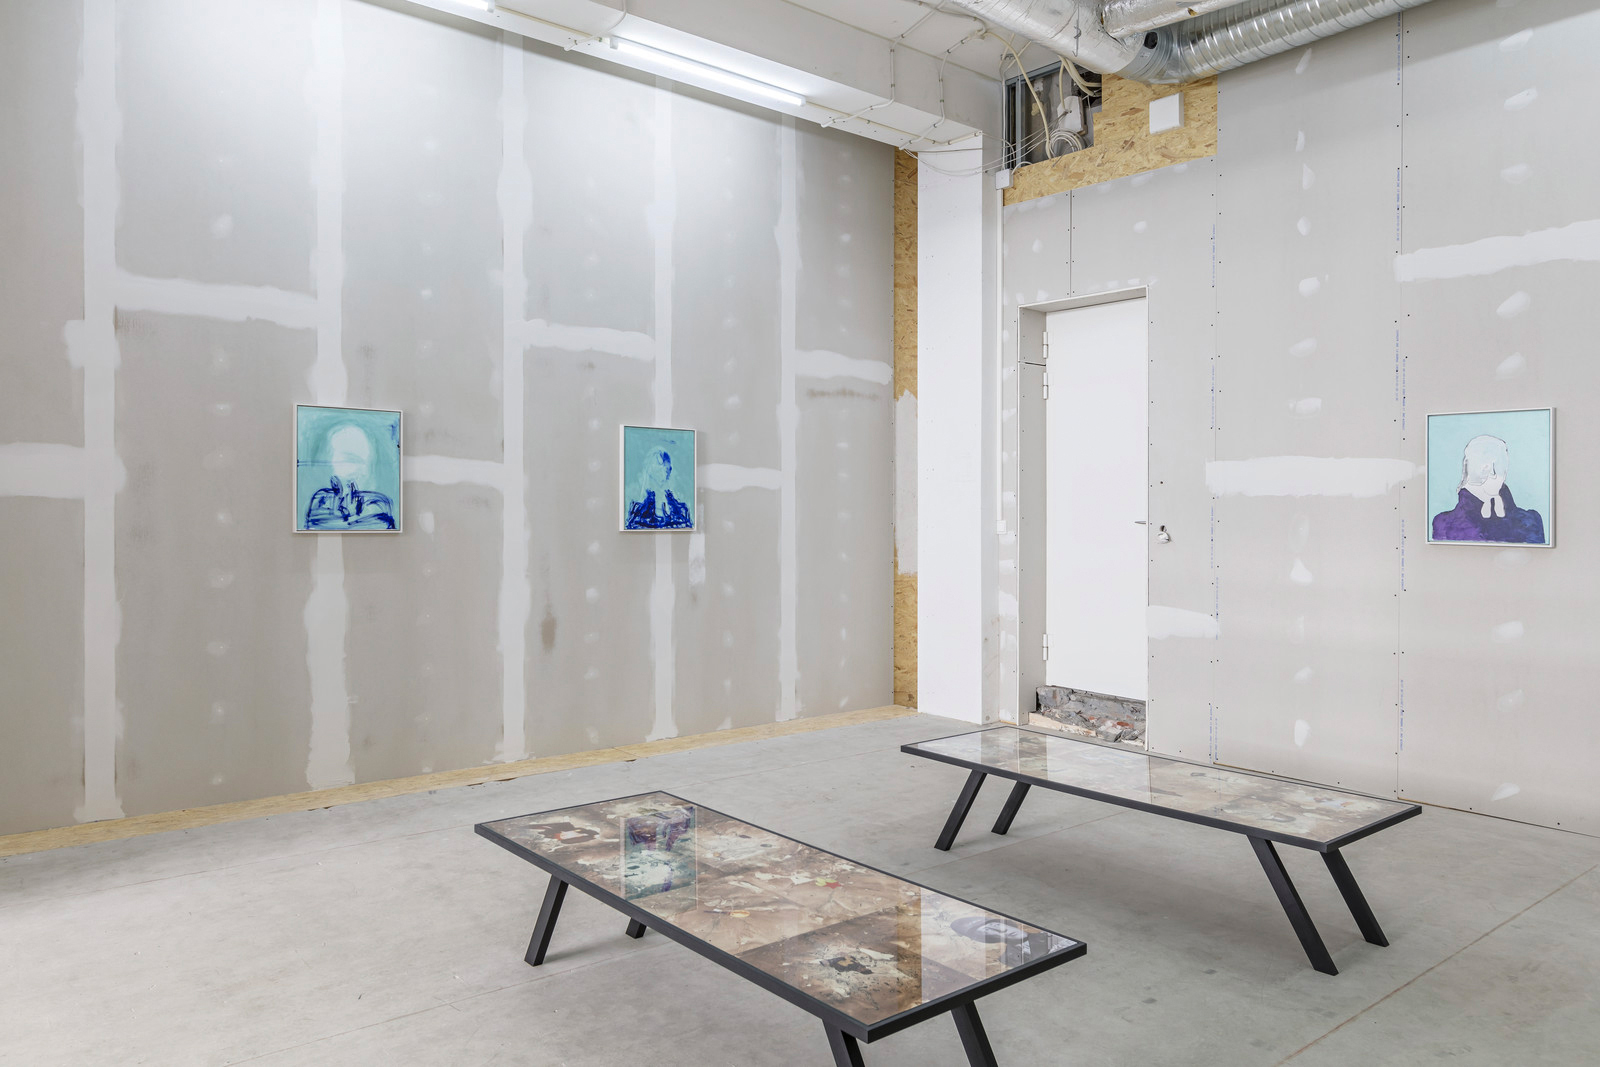 Choice of matter, Ivan Galuzin, installation view